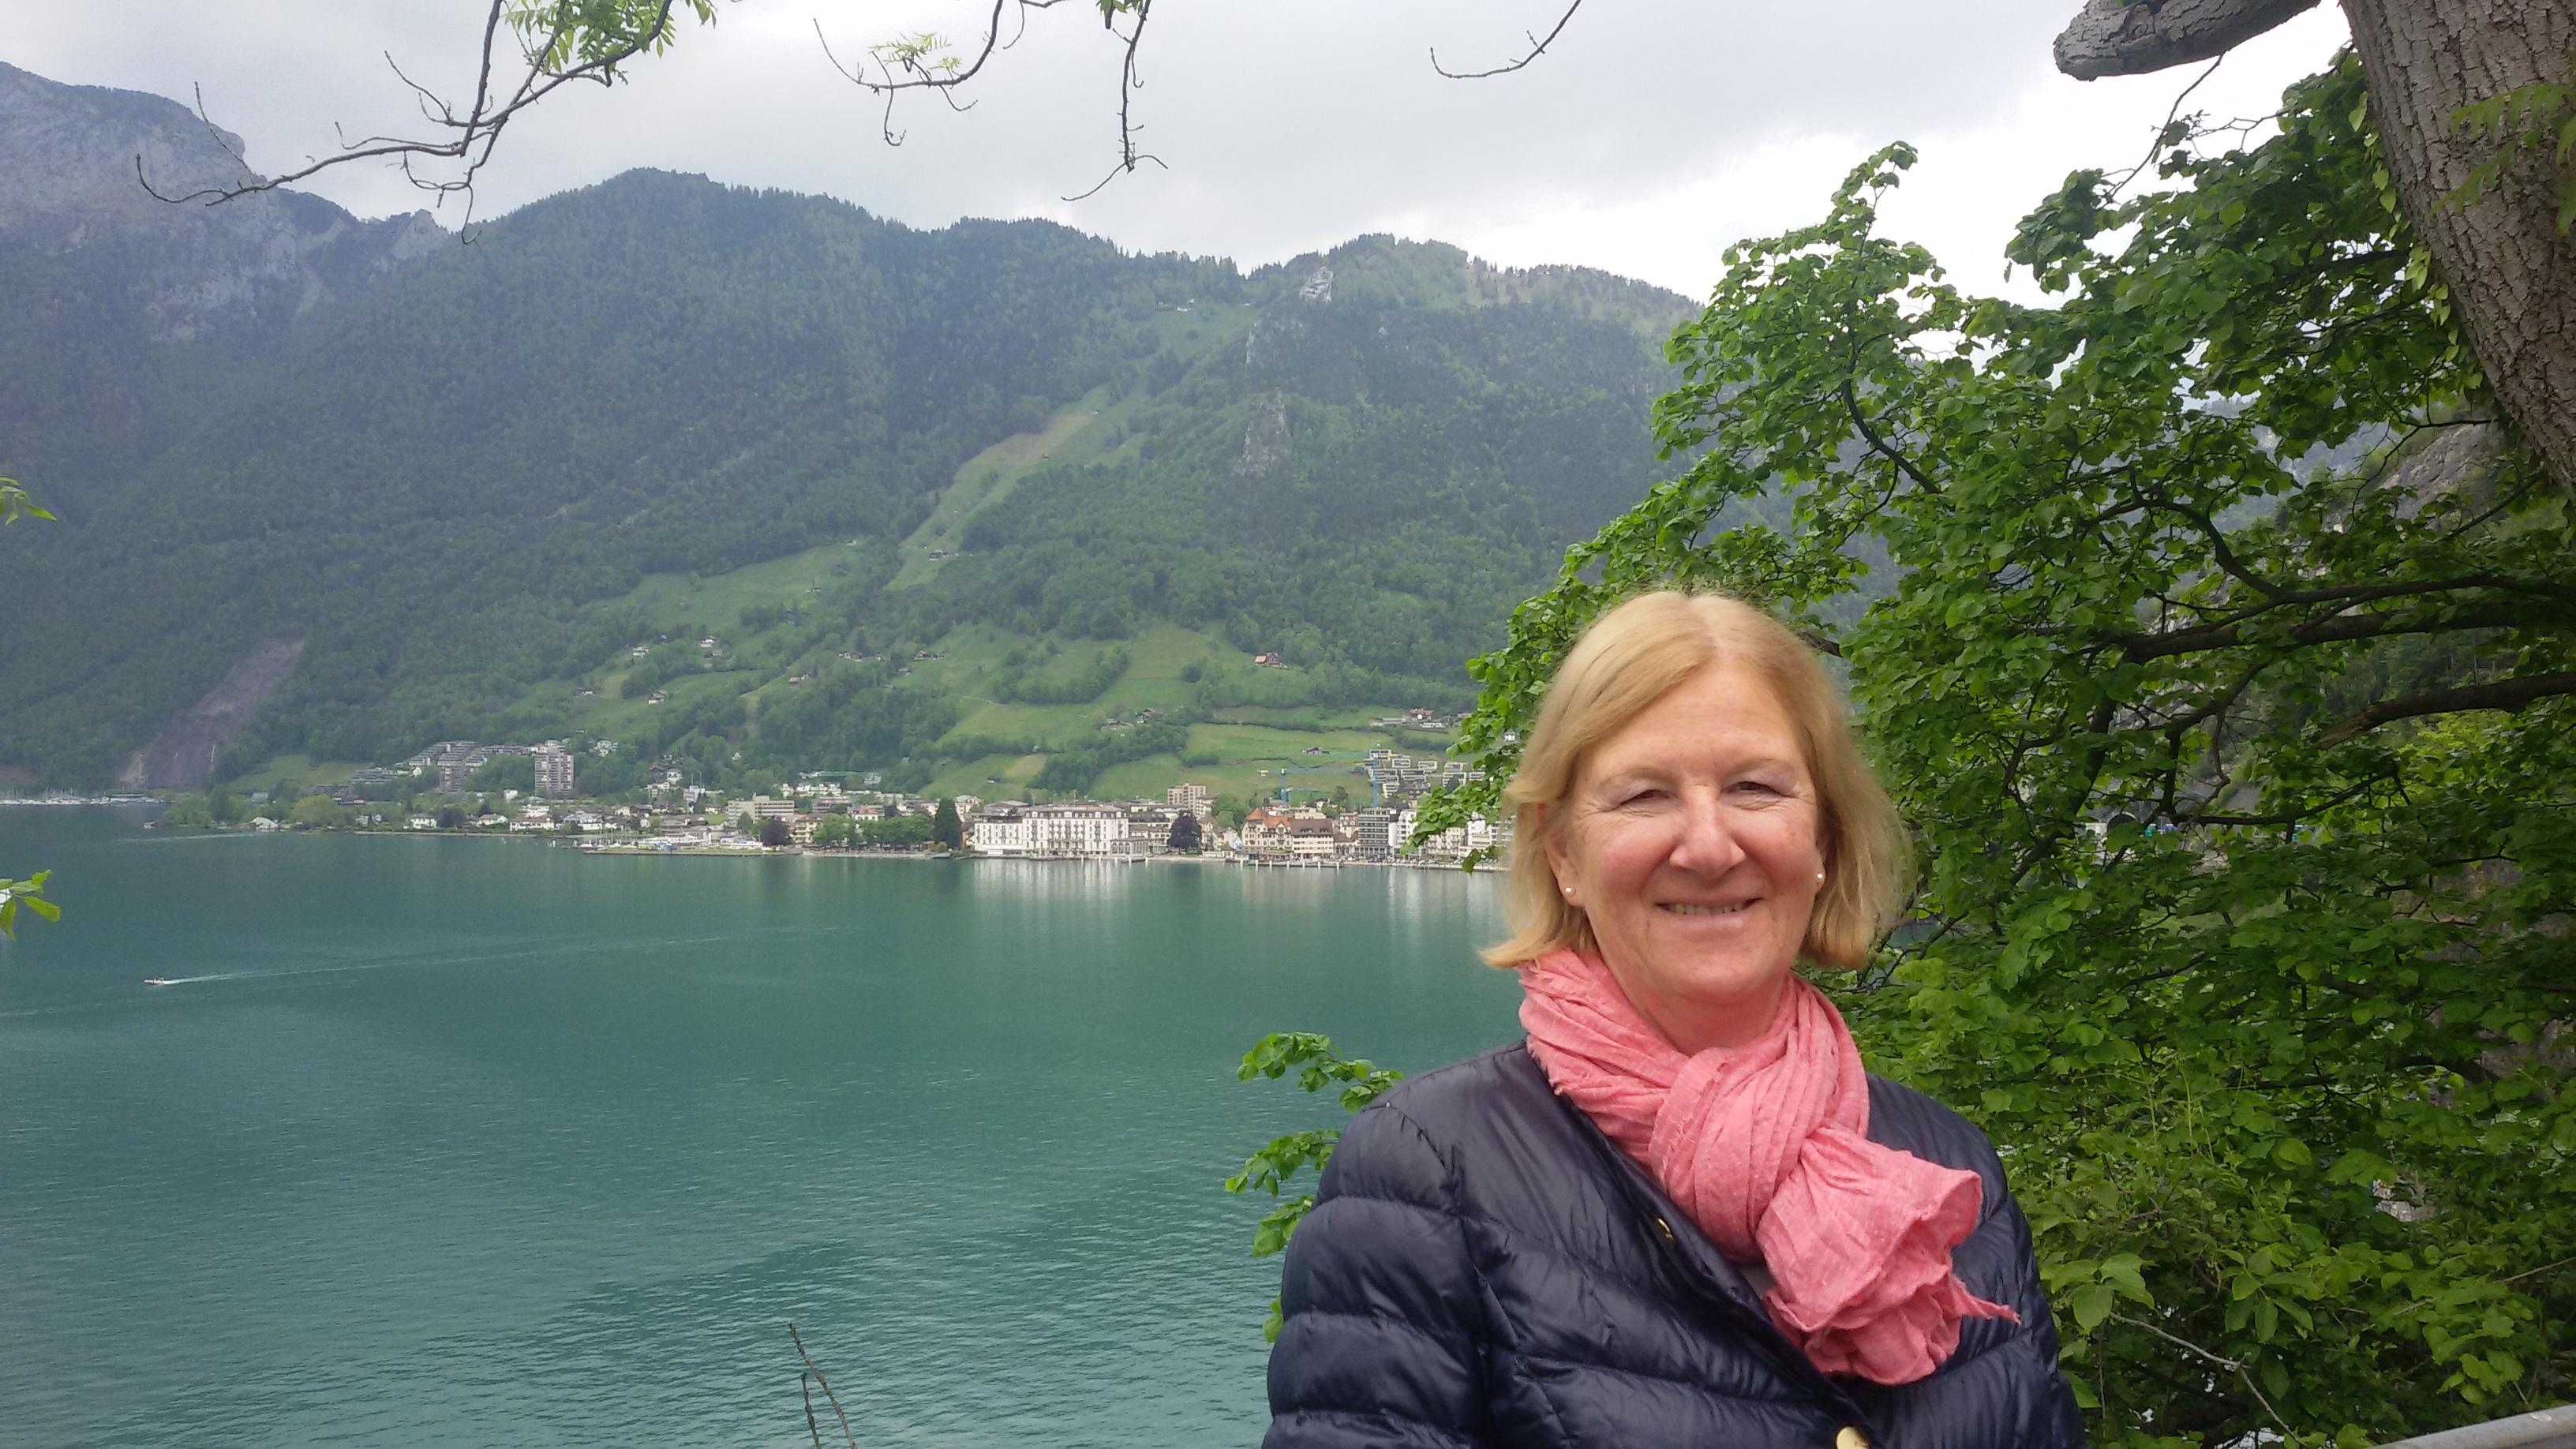 Cornelia Füger